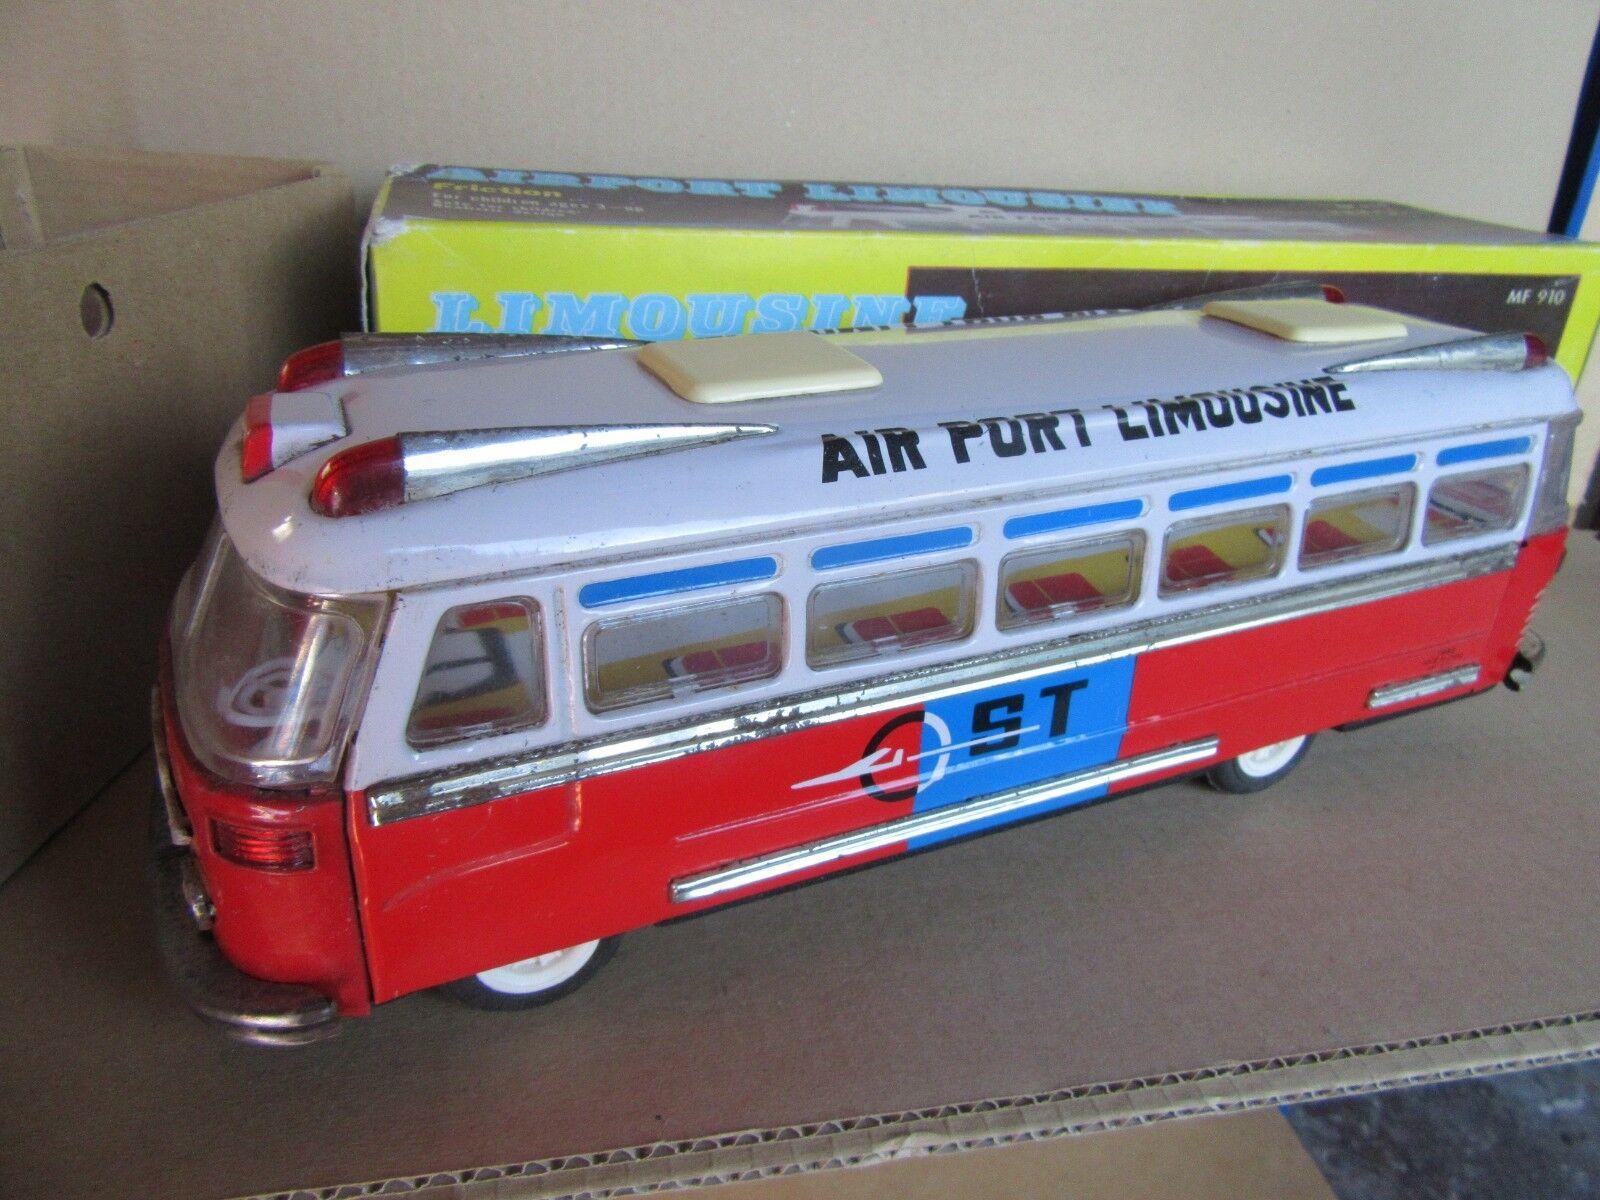 30H MF-910 Juguete Anteriores a la Fricción 1970s Bus Airport Limusina ST